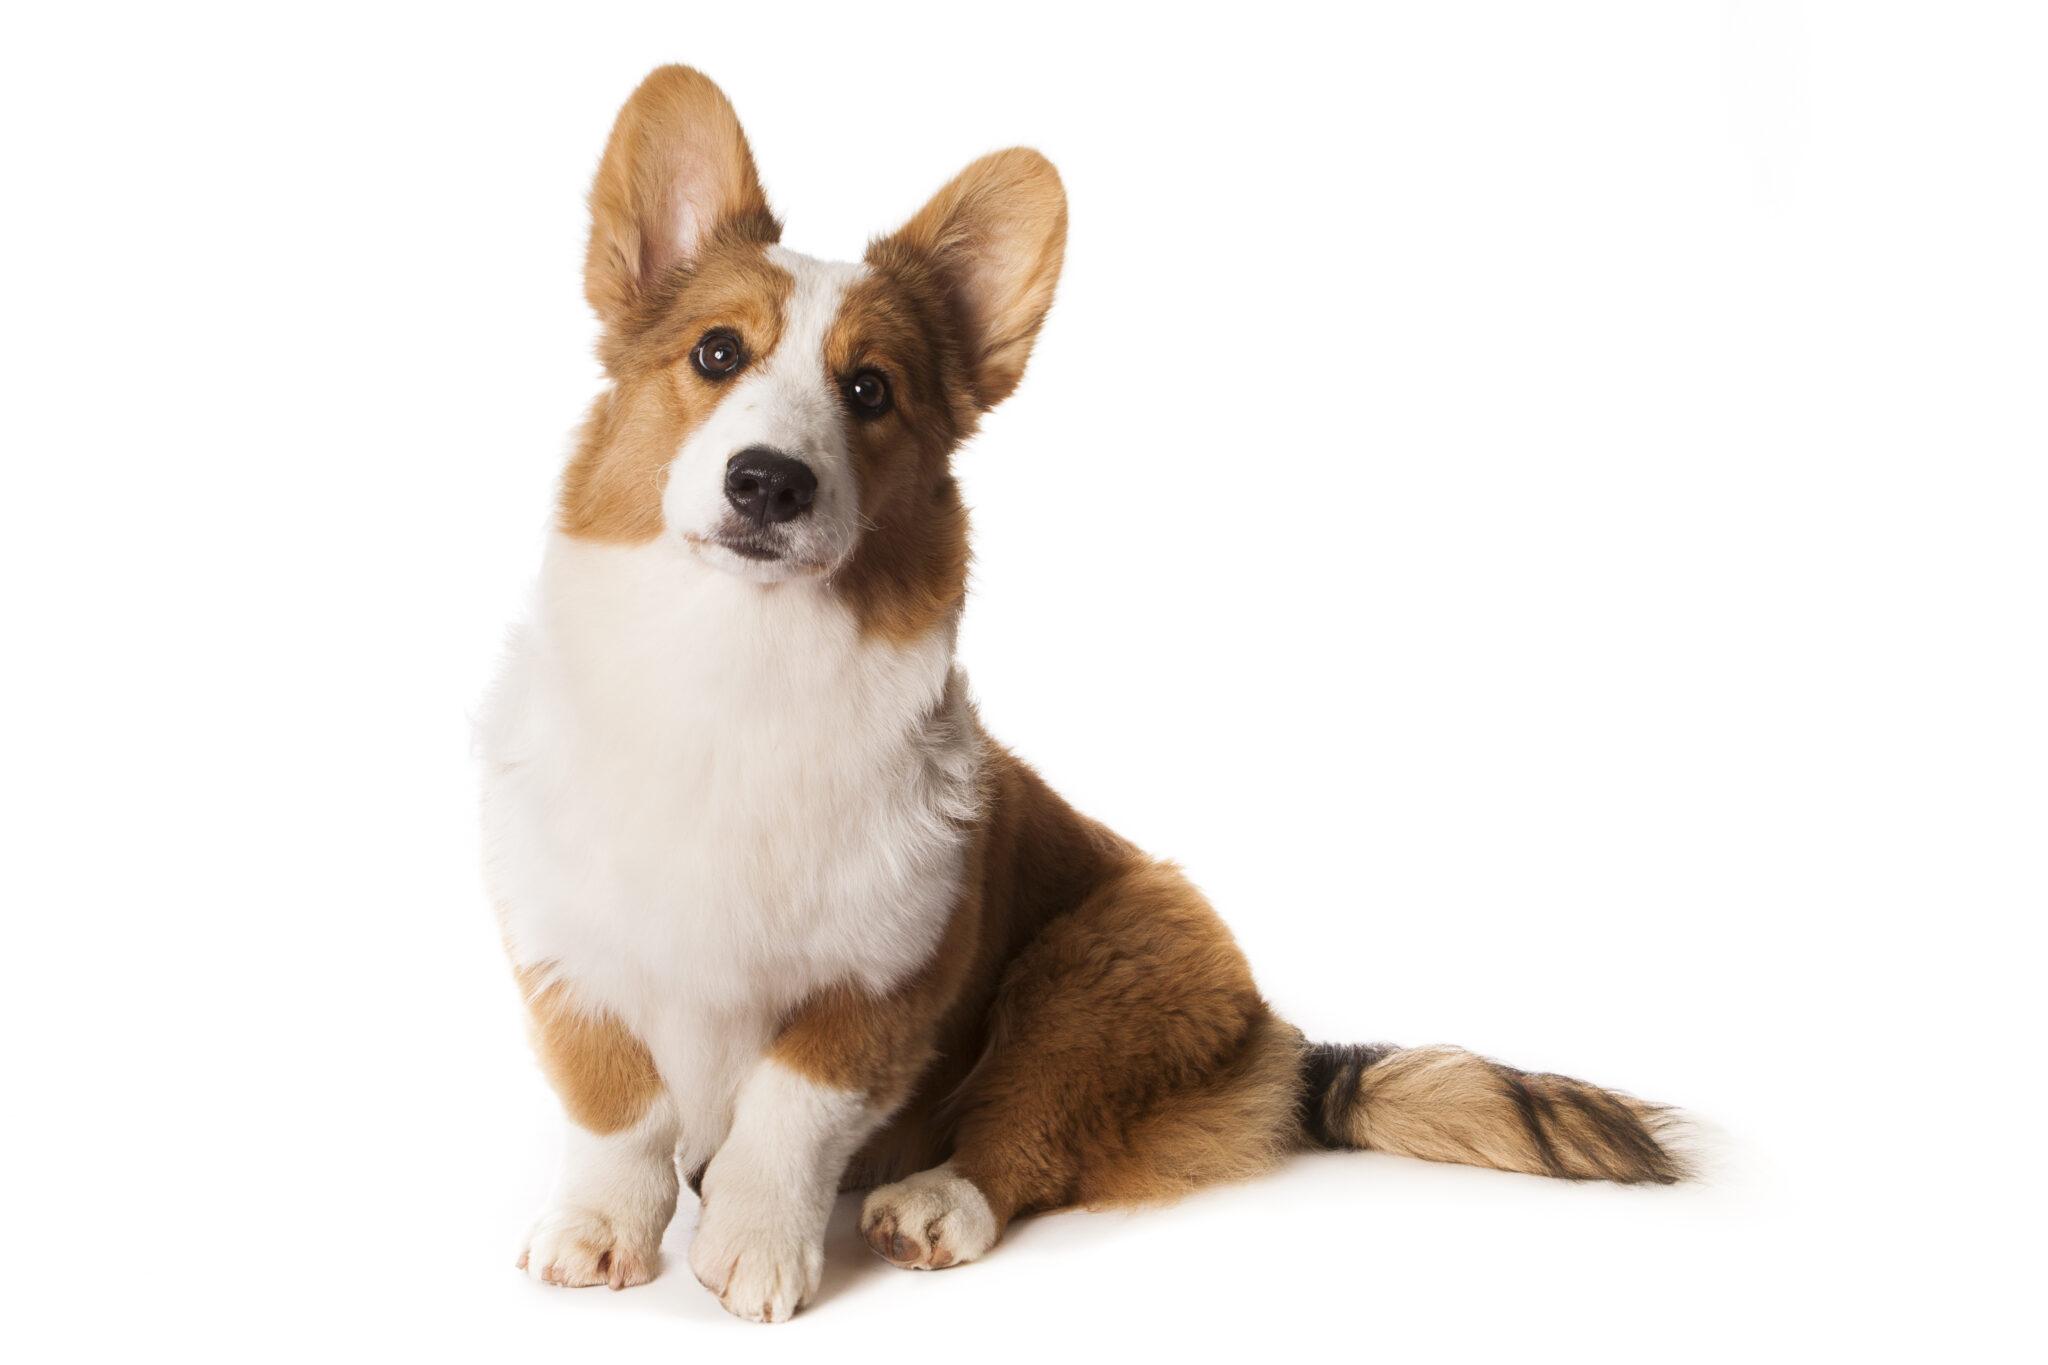 Cardigan Welsh Corgis: Dog breed info, photos, common ...